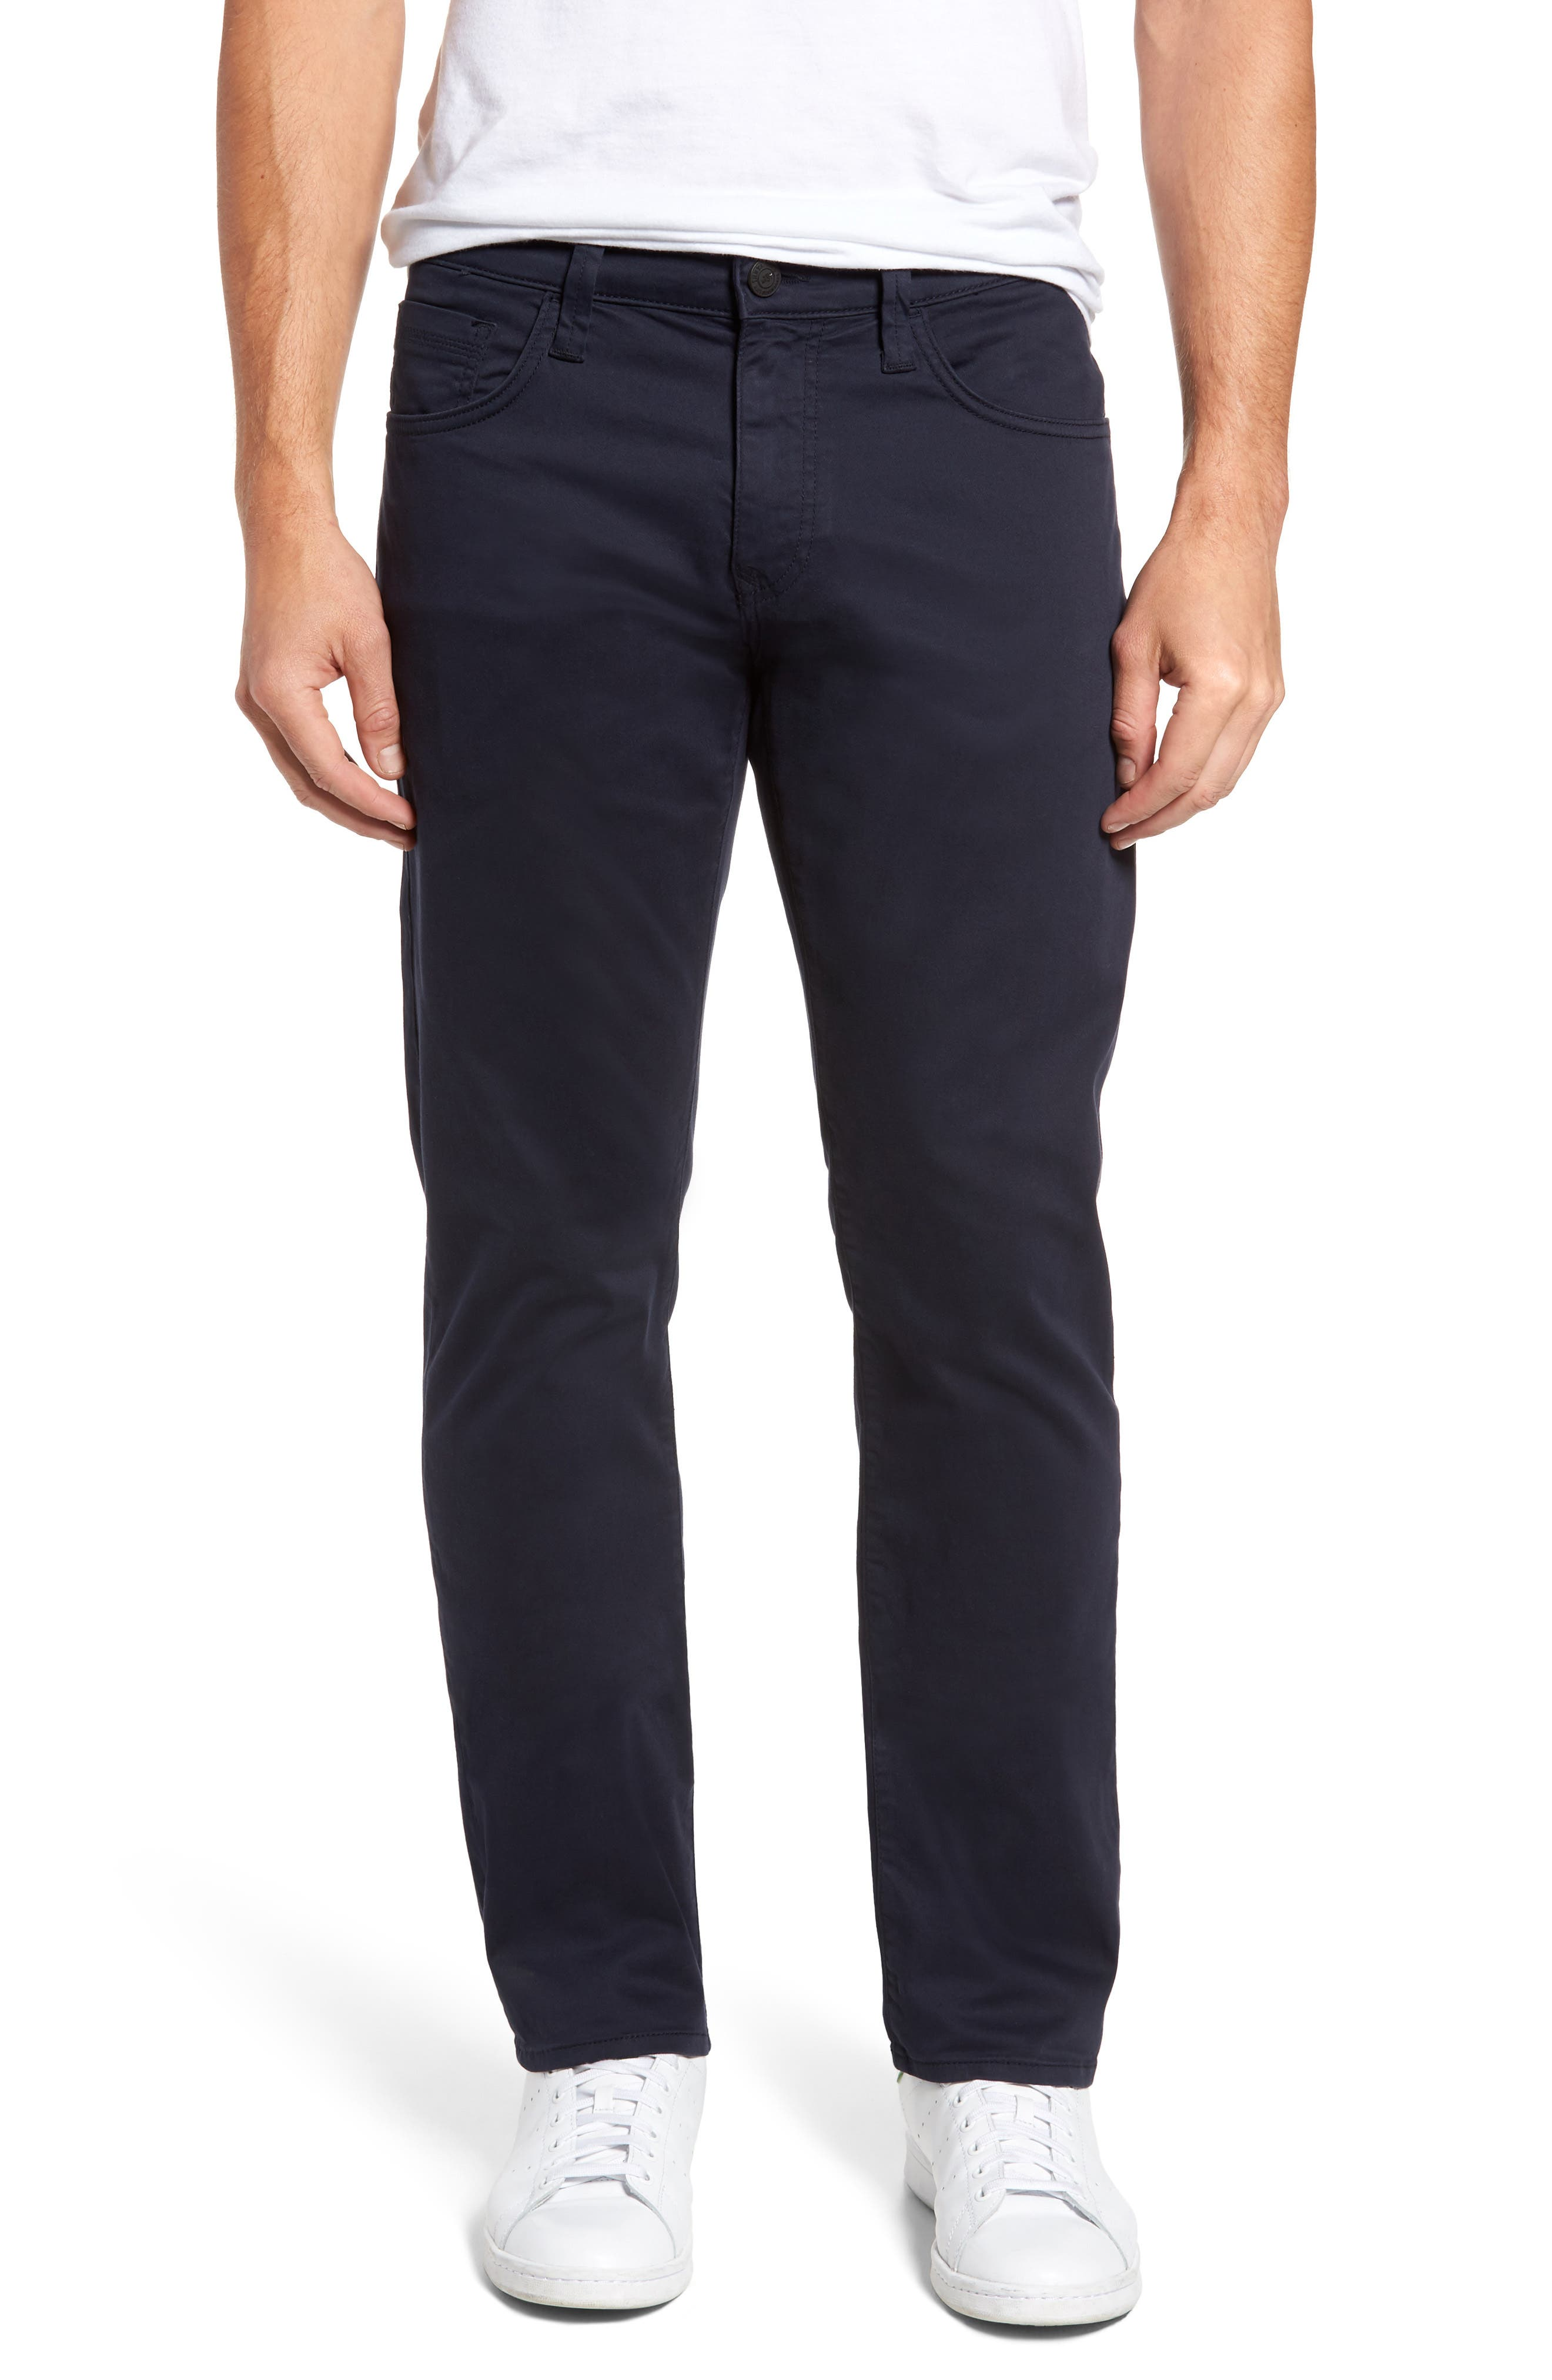 Main Image - Mavi Jeans Zach Straight Fit Twill Pants (Dark Navy Twill)